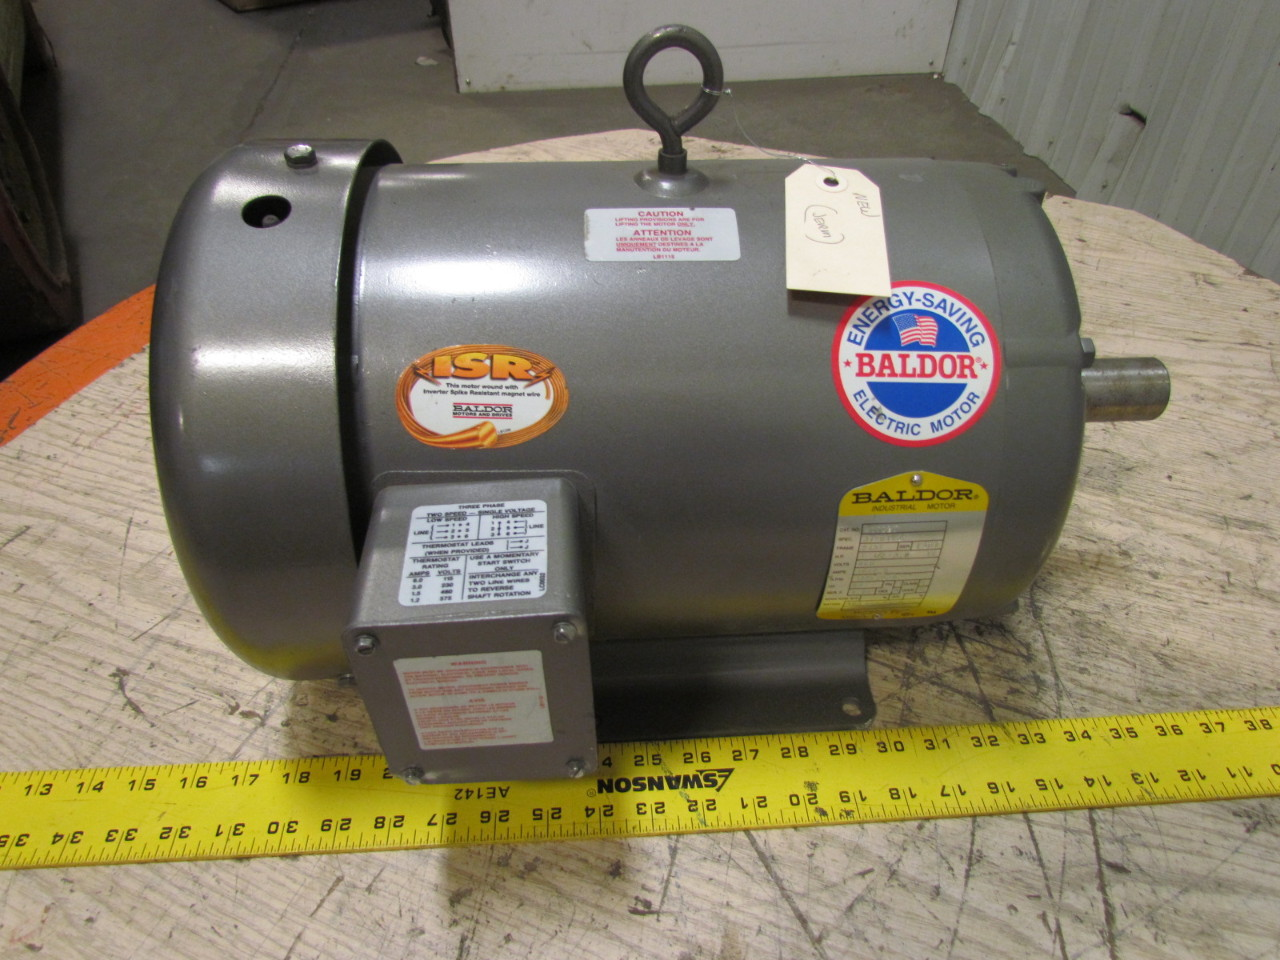 Baldor M1709t 3 Phase Ac Electric Motor 1725 850 Rpm 460v